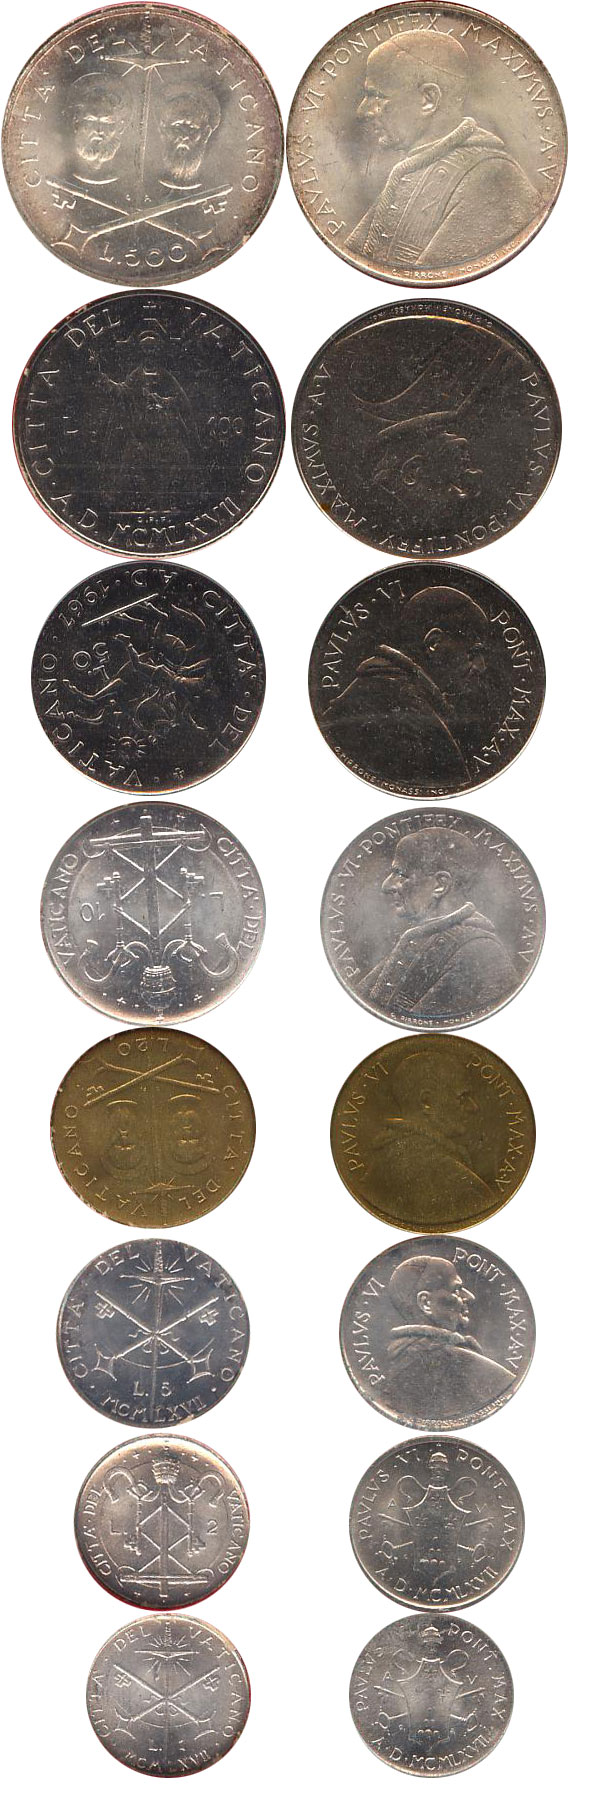 Набор монет Ватикан Набор монет 1967 года 1967 UNC фото 2